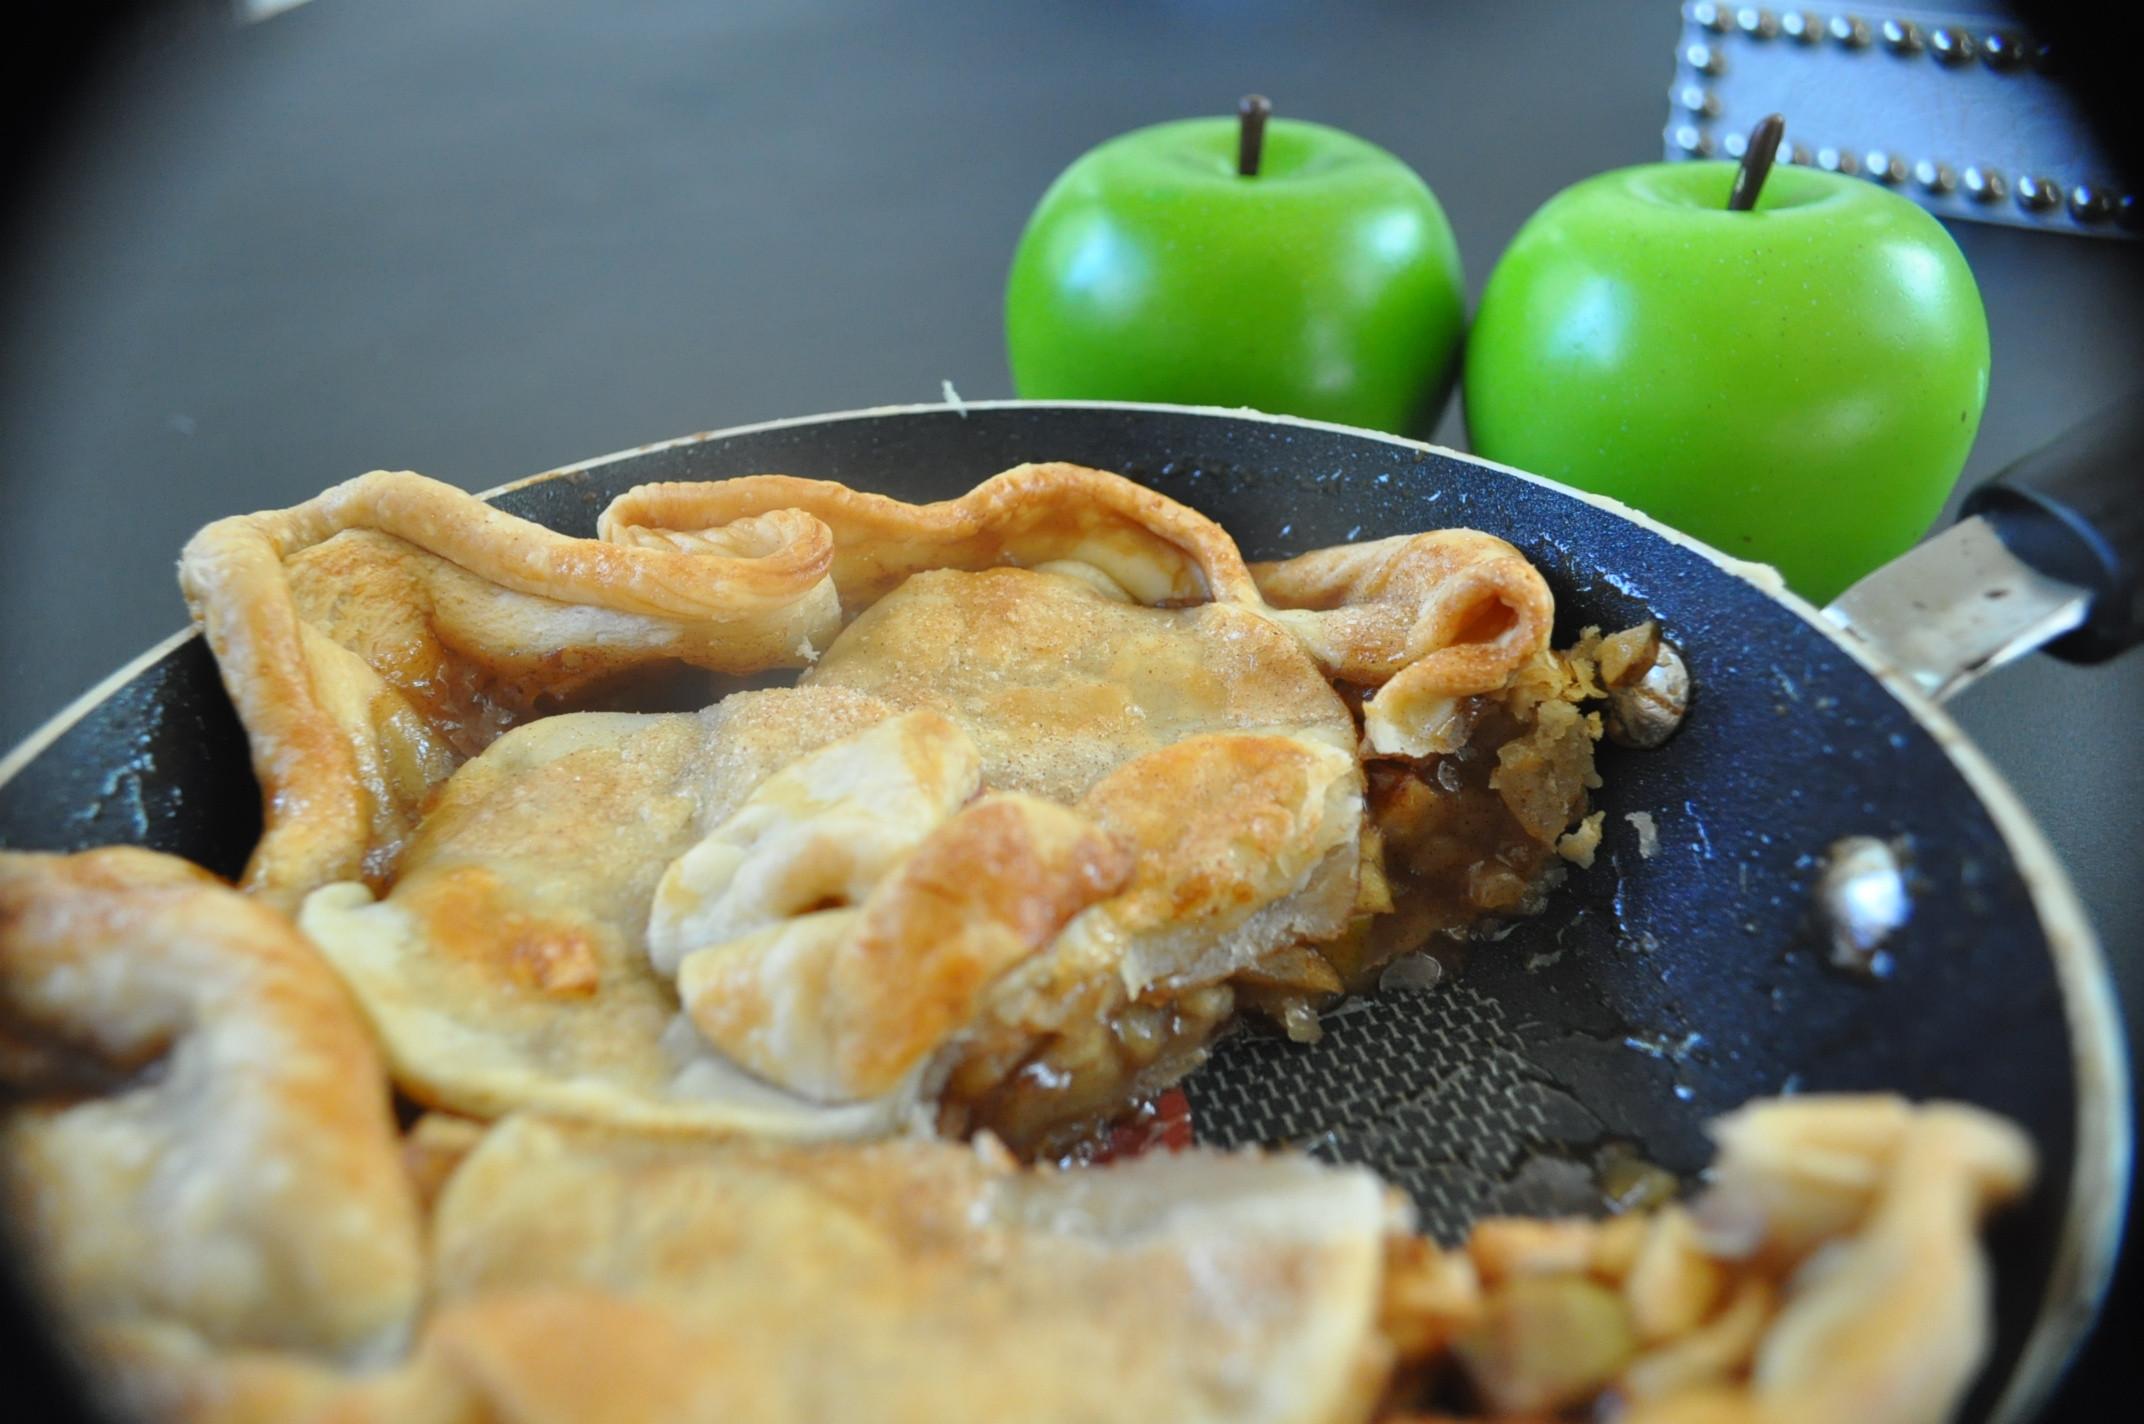 Trisha Yearwood Skillet Apple Pie  Blog Archive DSC 0229